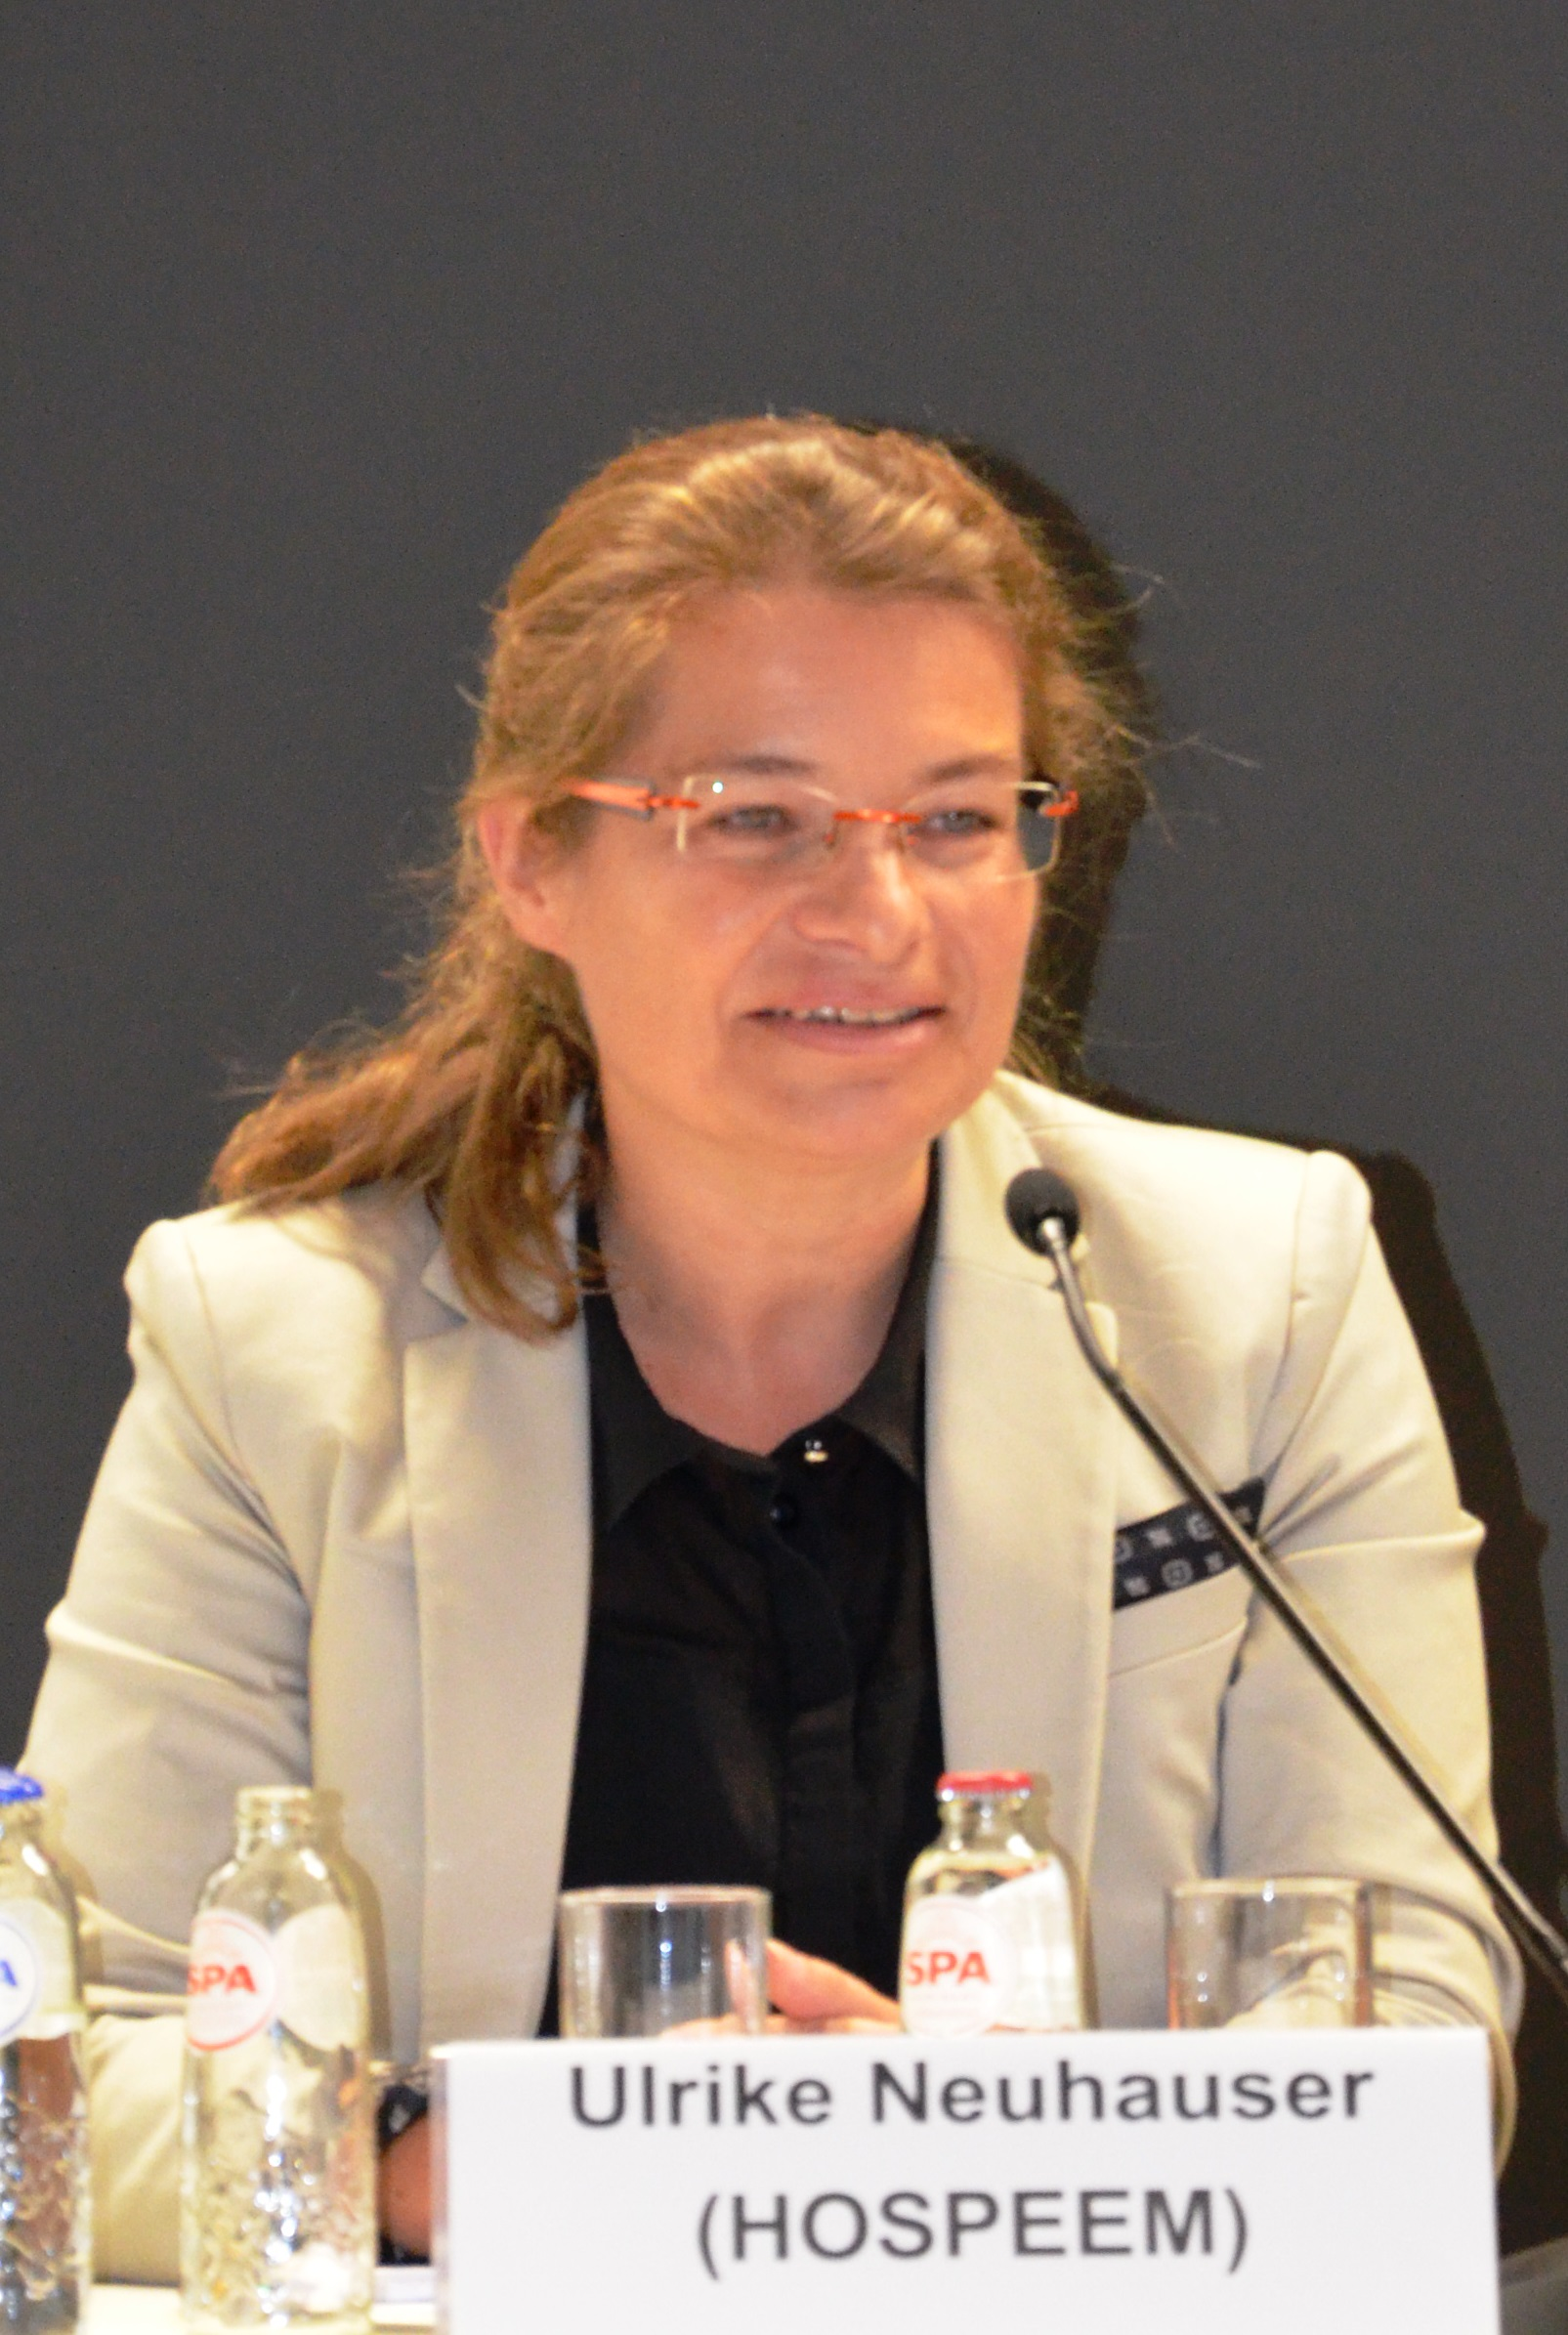 Ulrike Neuhauser